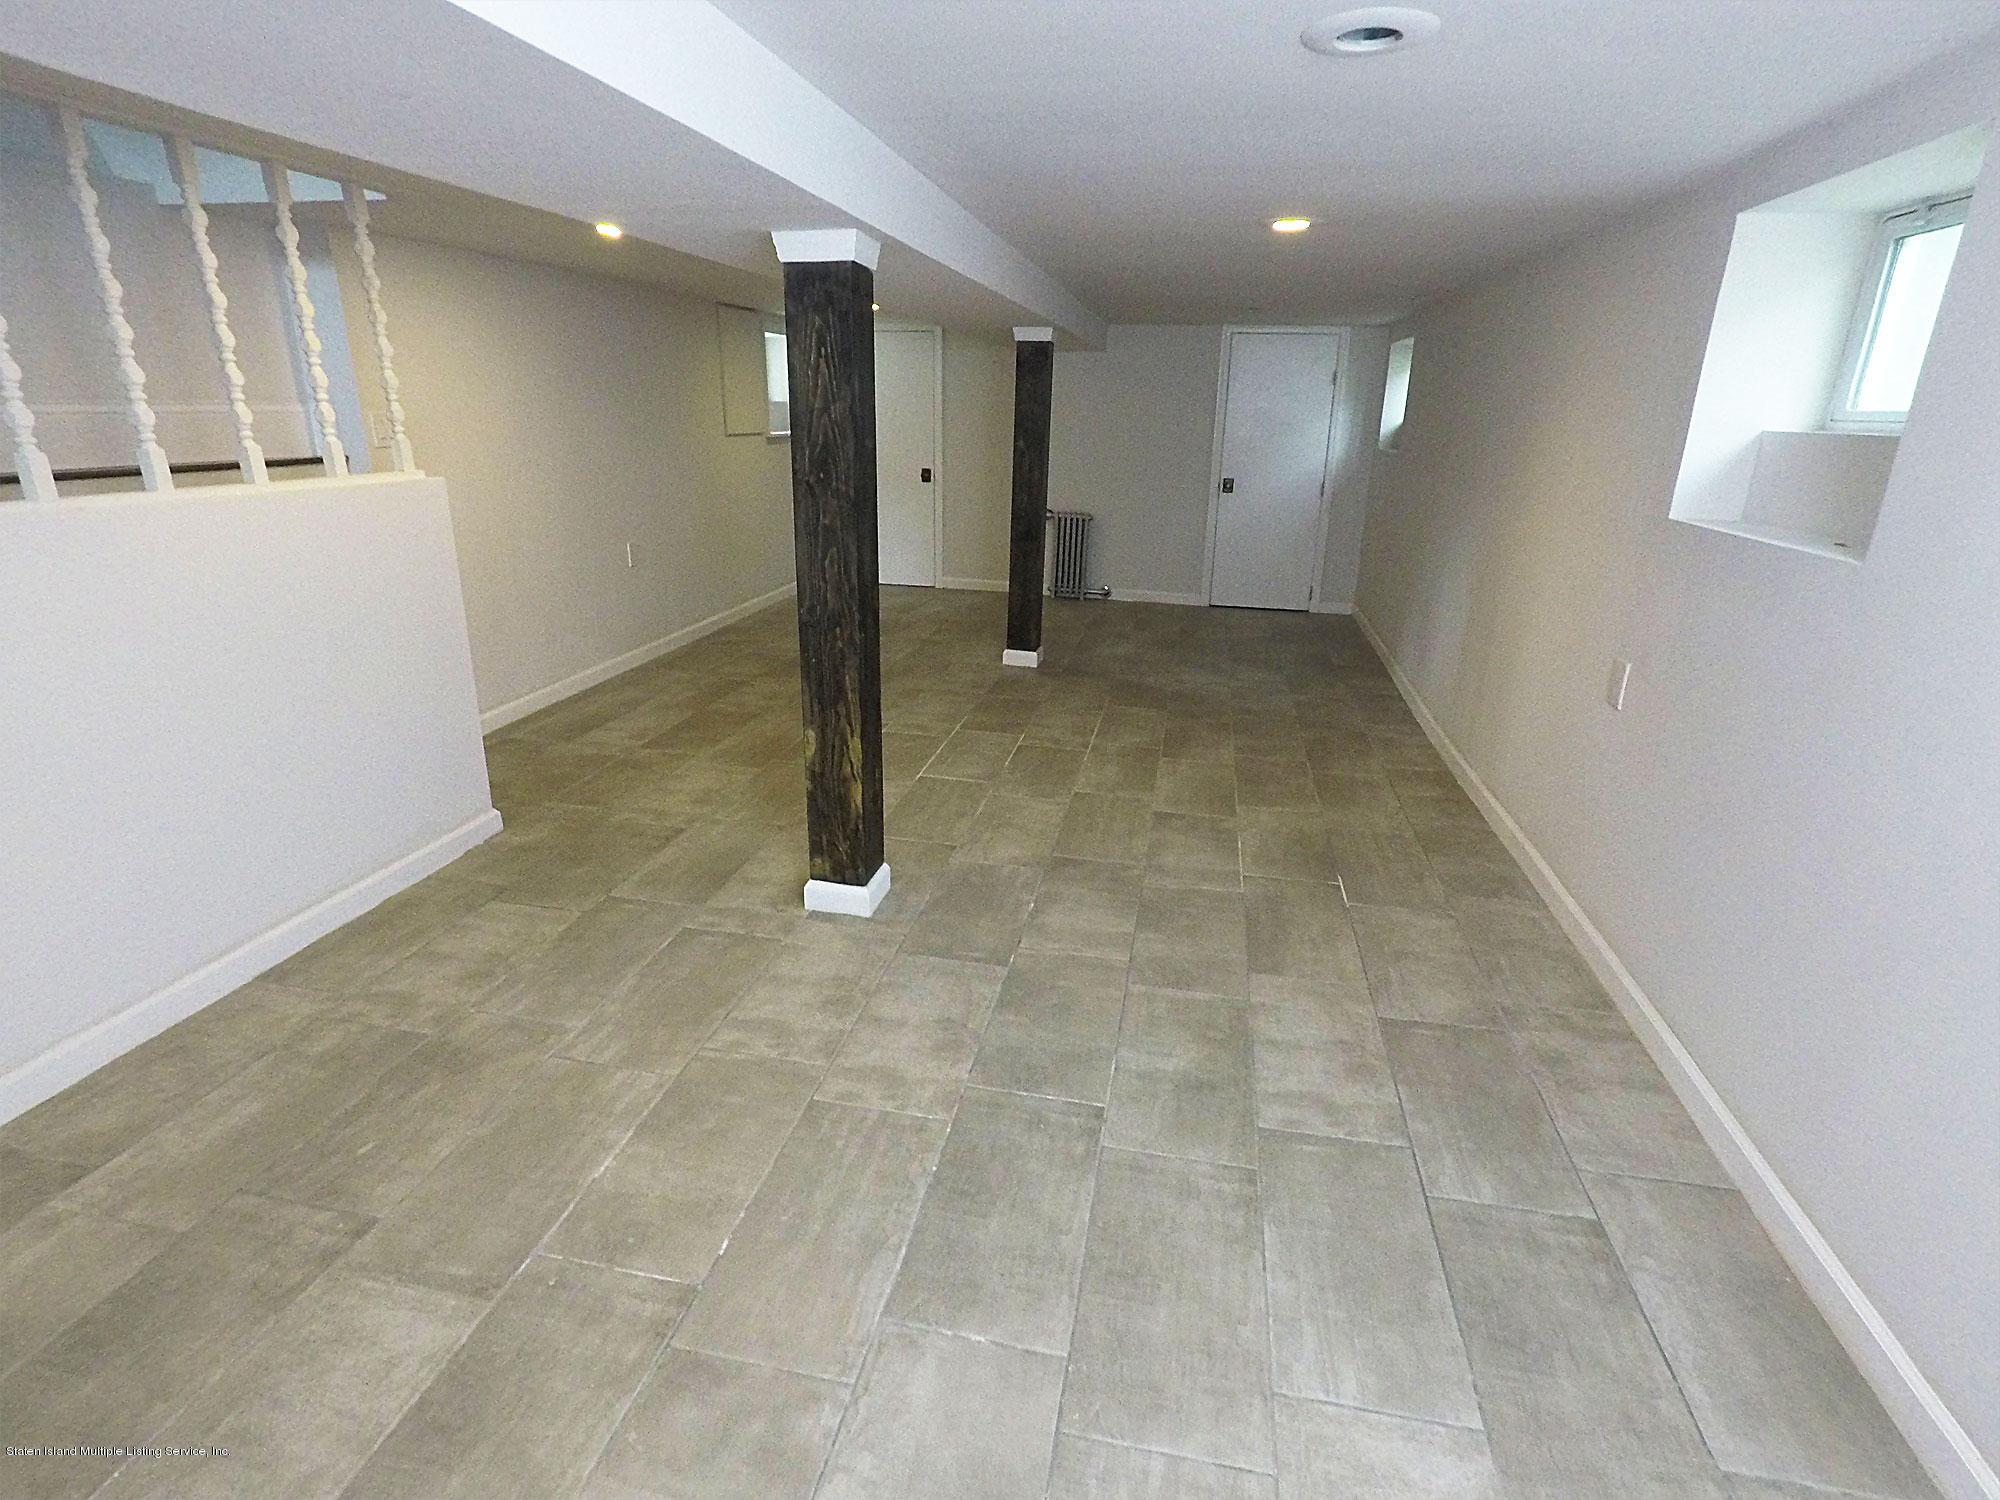 Single Family - Detached 115 Woodbine Avenue  Staten Island, NY 10314, MLS-1123689-32